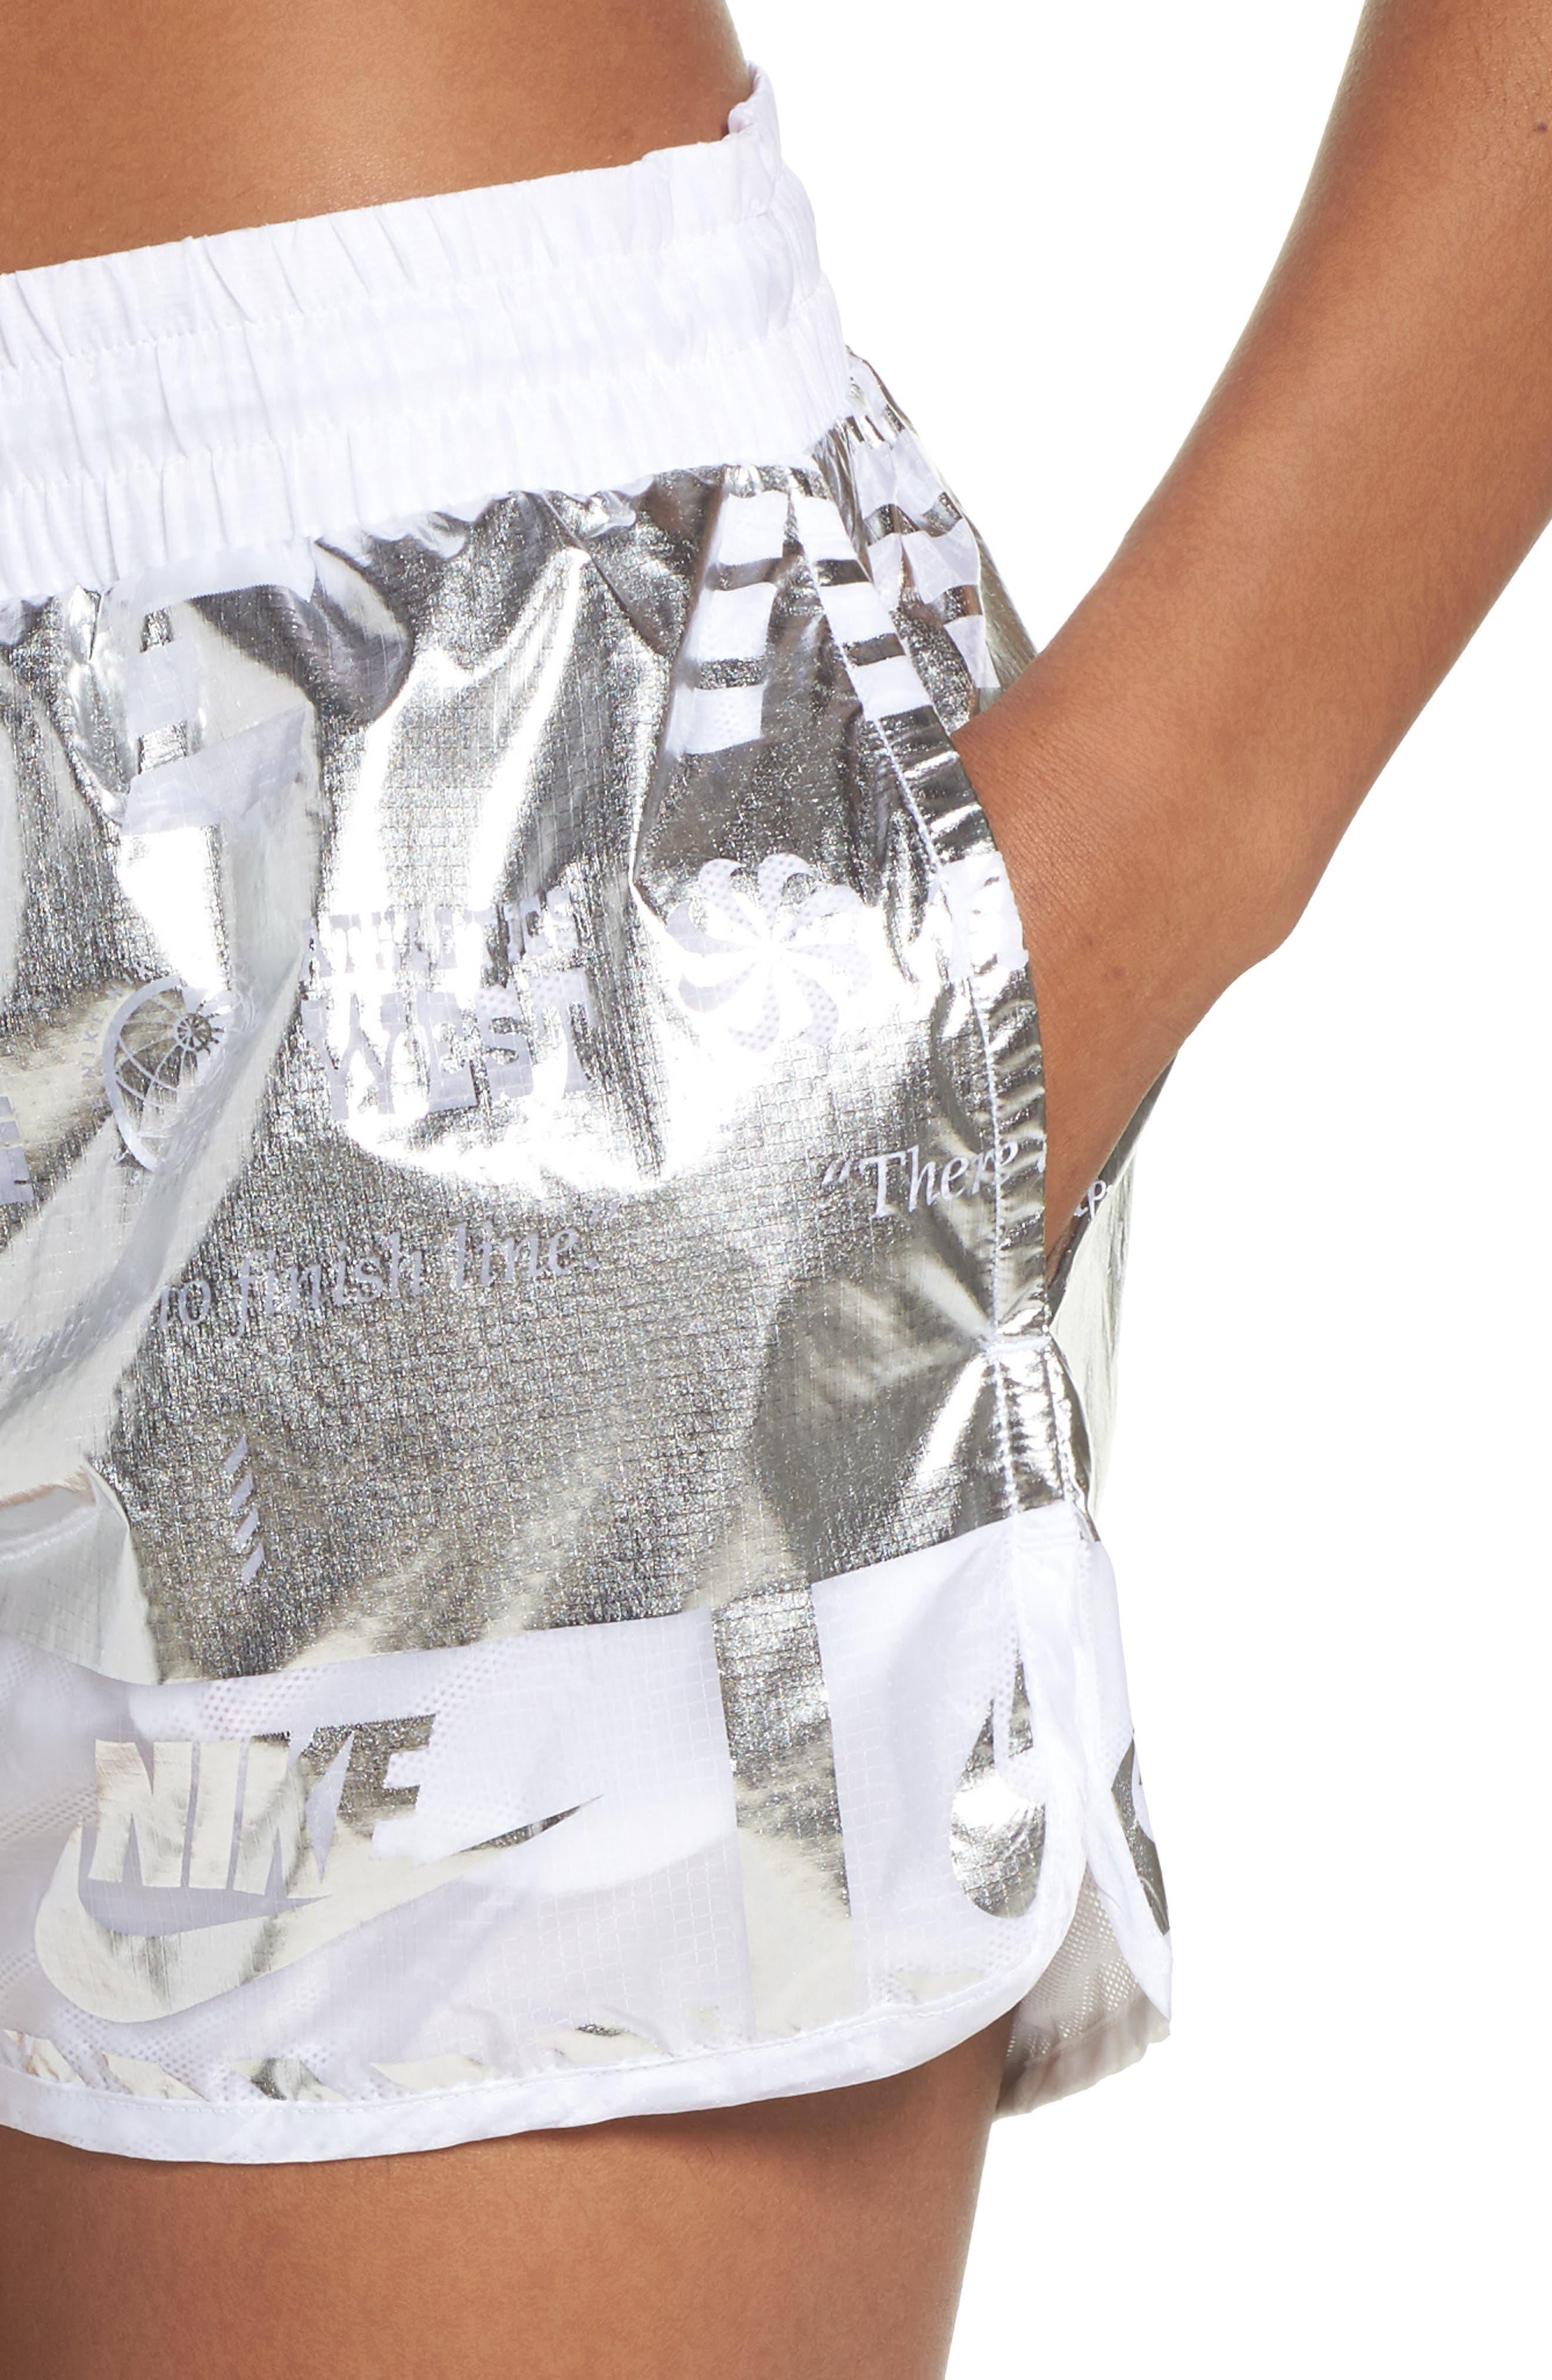 Sportswear Women's Metallic Shorts,                             Alternate thumbnail 4, color,                             White/ White